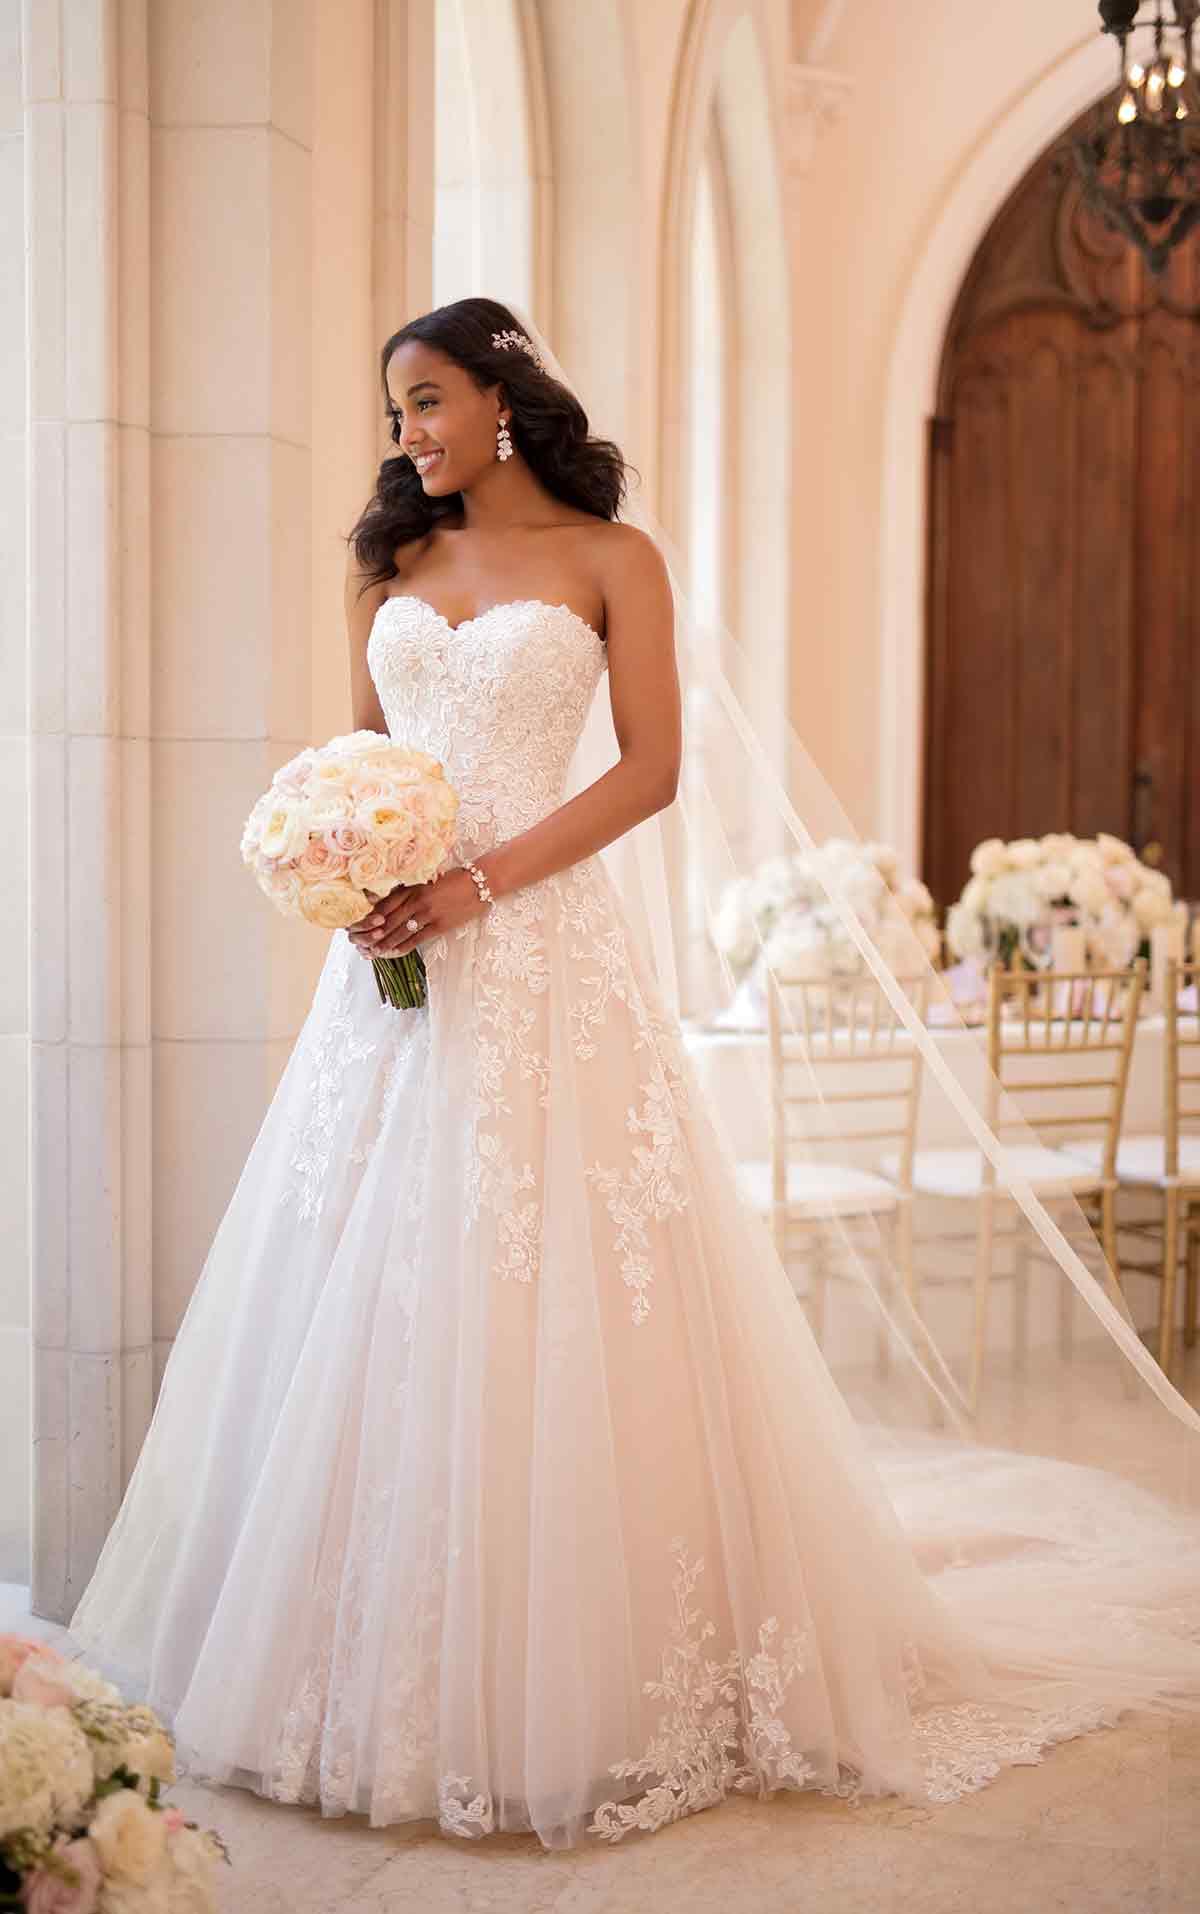 Affordable Wedding Dress Designer Stella York Reveals New ...